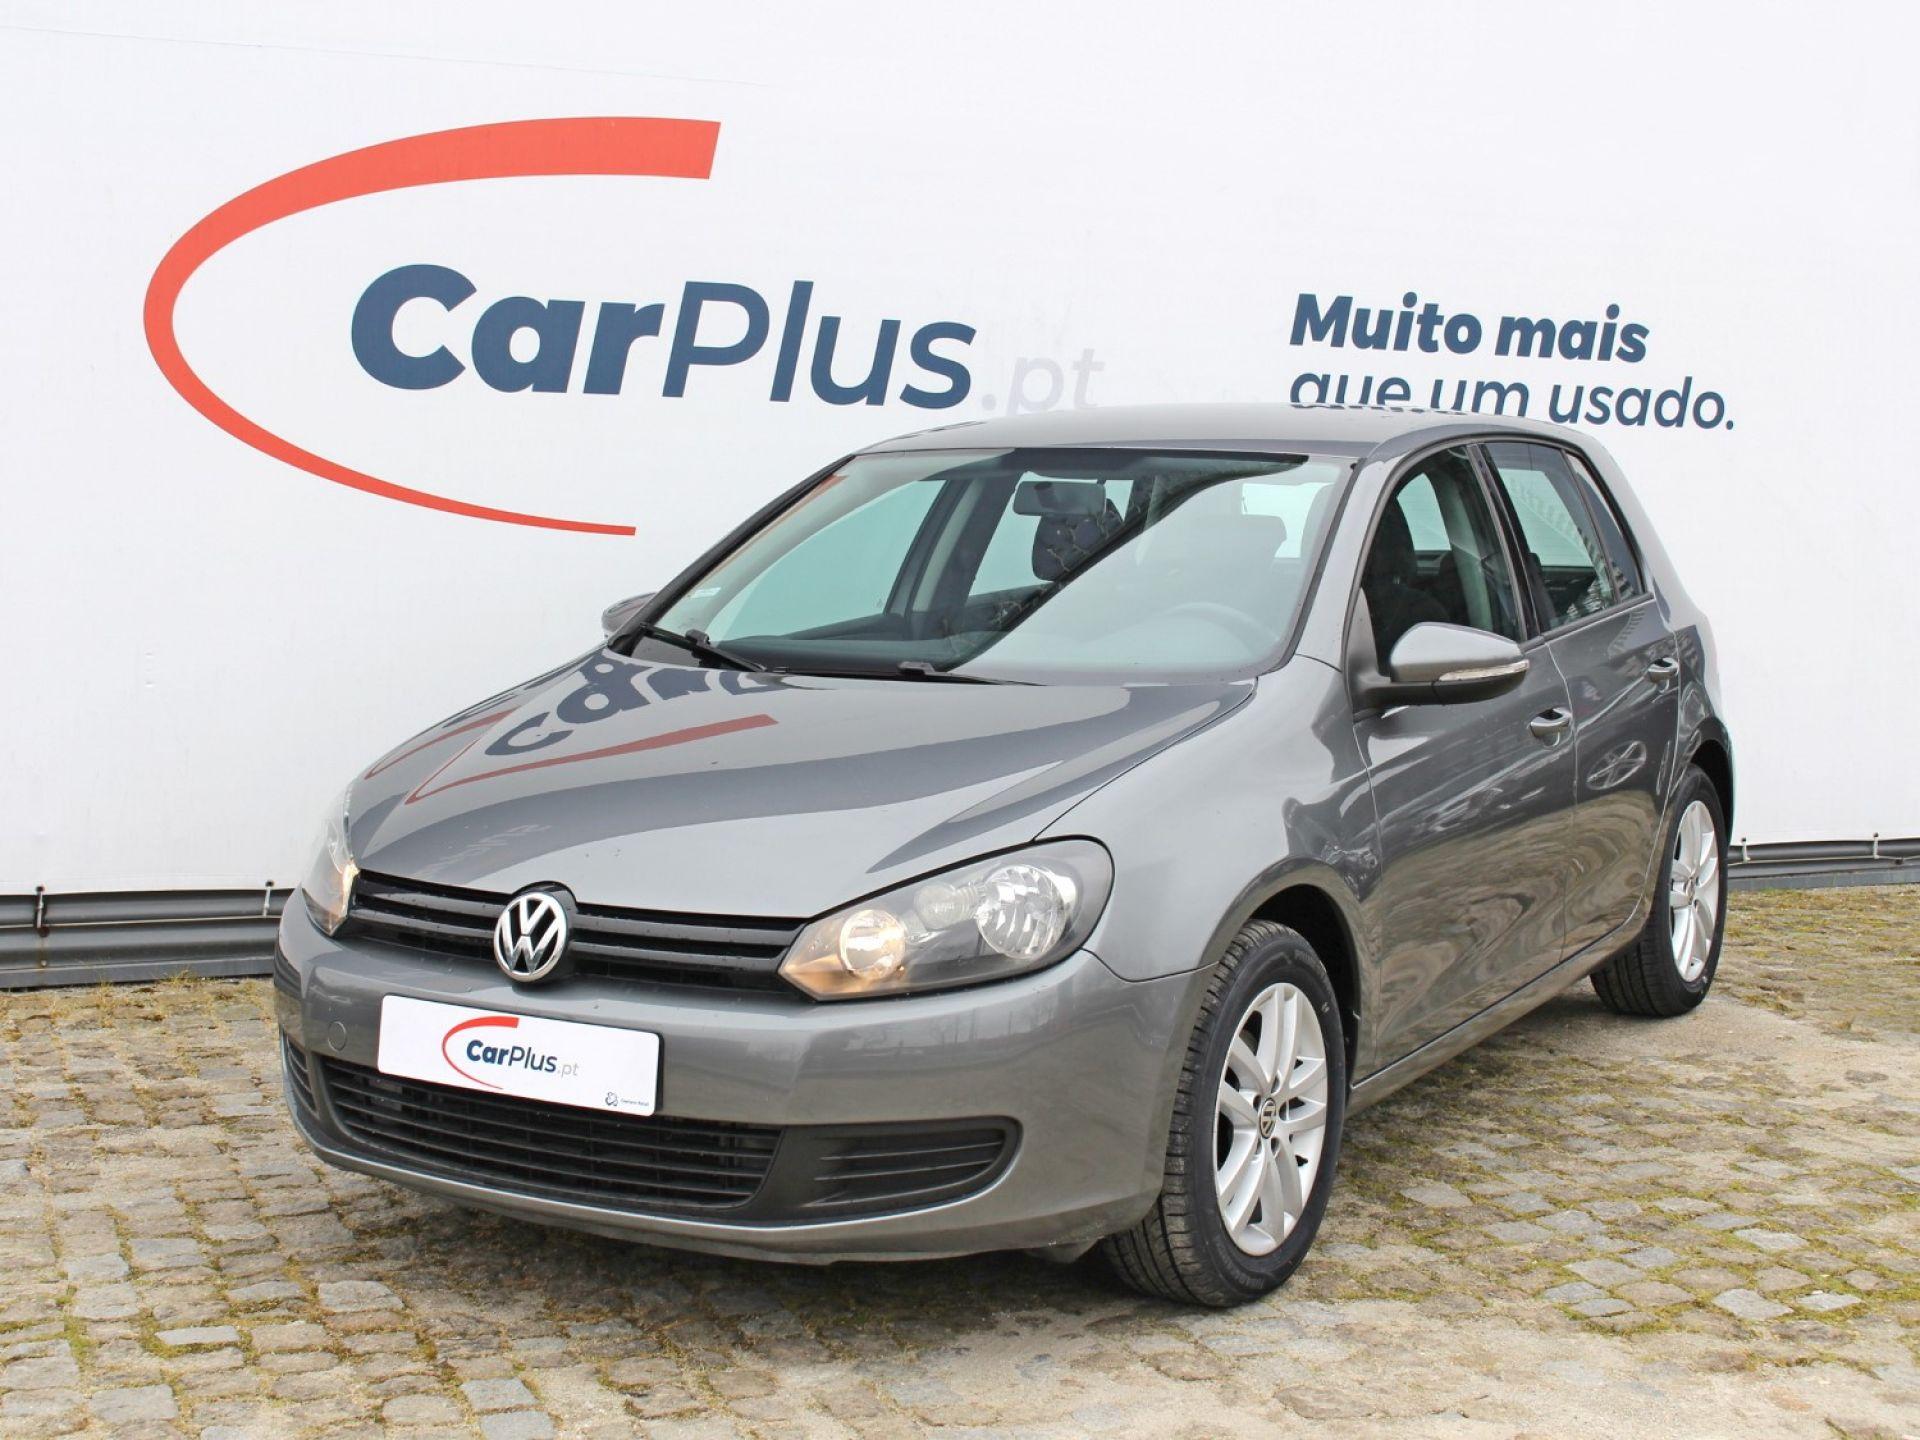 Volkswagen Golf 1.6 TDI DPF 105cv Trendline segunda mão Porto